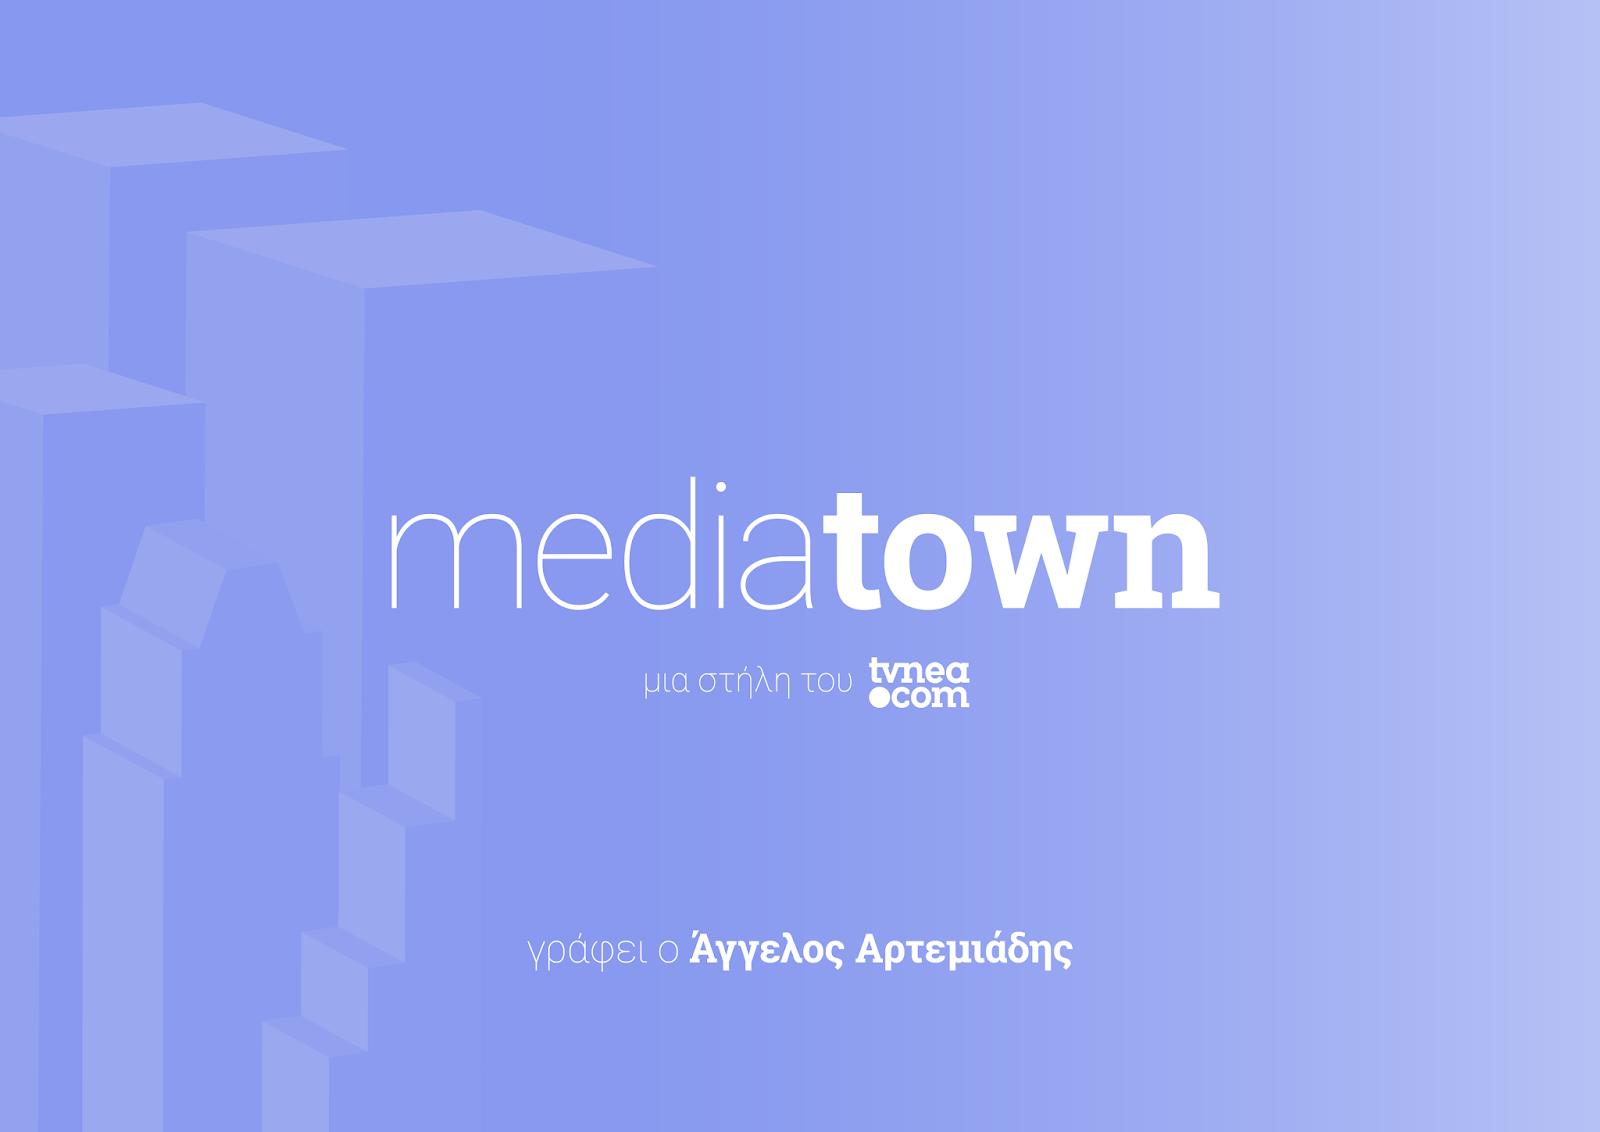 Mediatown: Μία βόλτα σε όλους τους τηλεοπτικούς δρόμους της μιντιακής μας πόλης... - Φωτογραφία 1